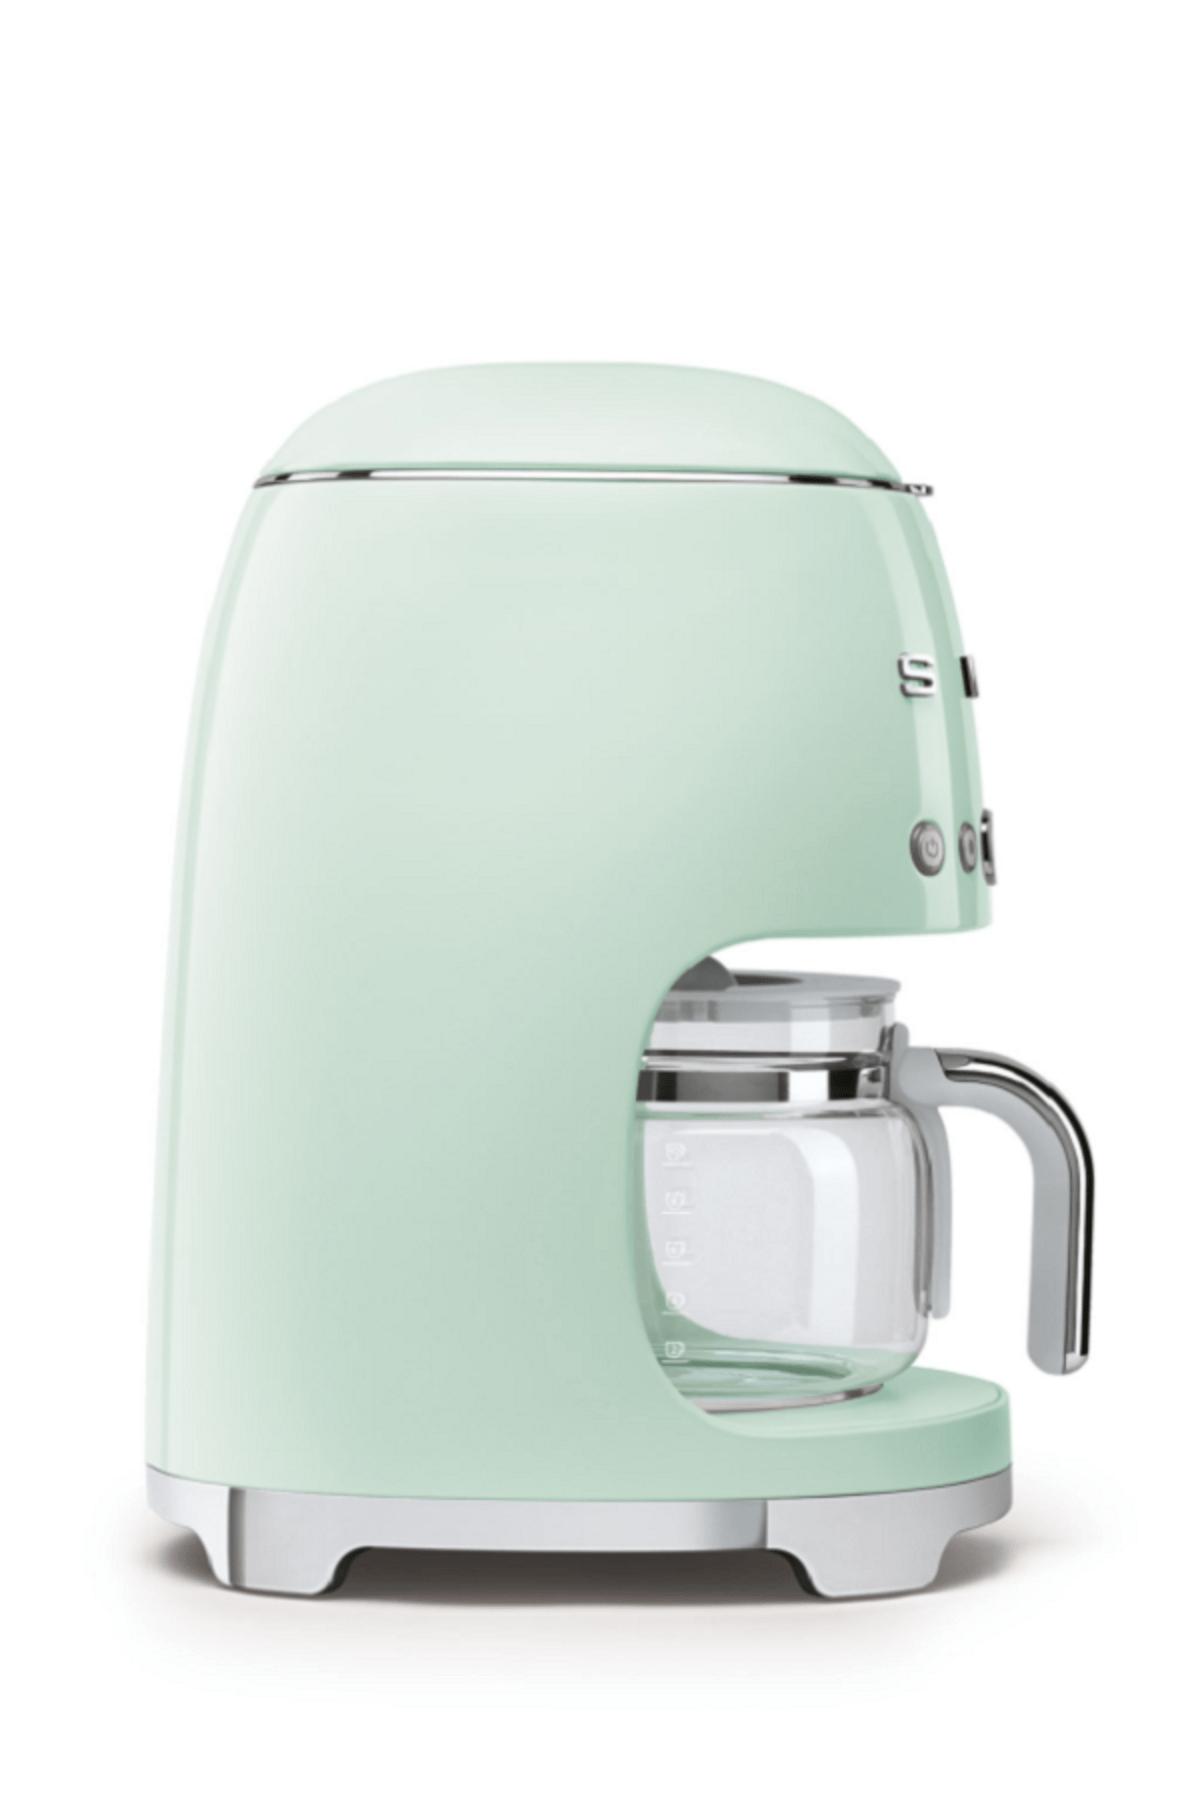 Smeg Pastel Yeşil Filtre Kahve Makinesi 3